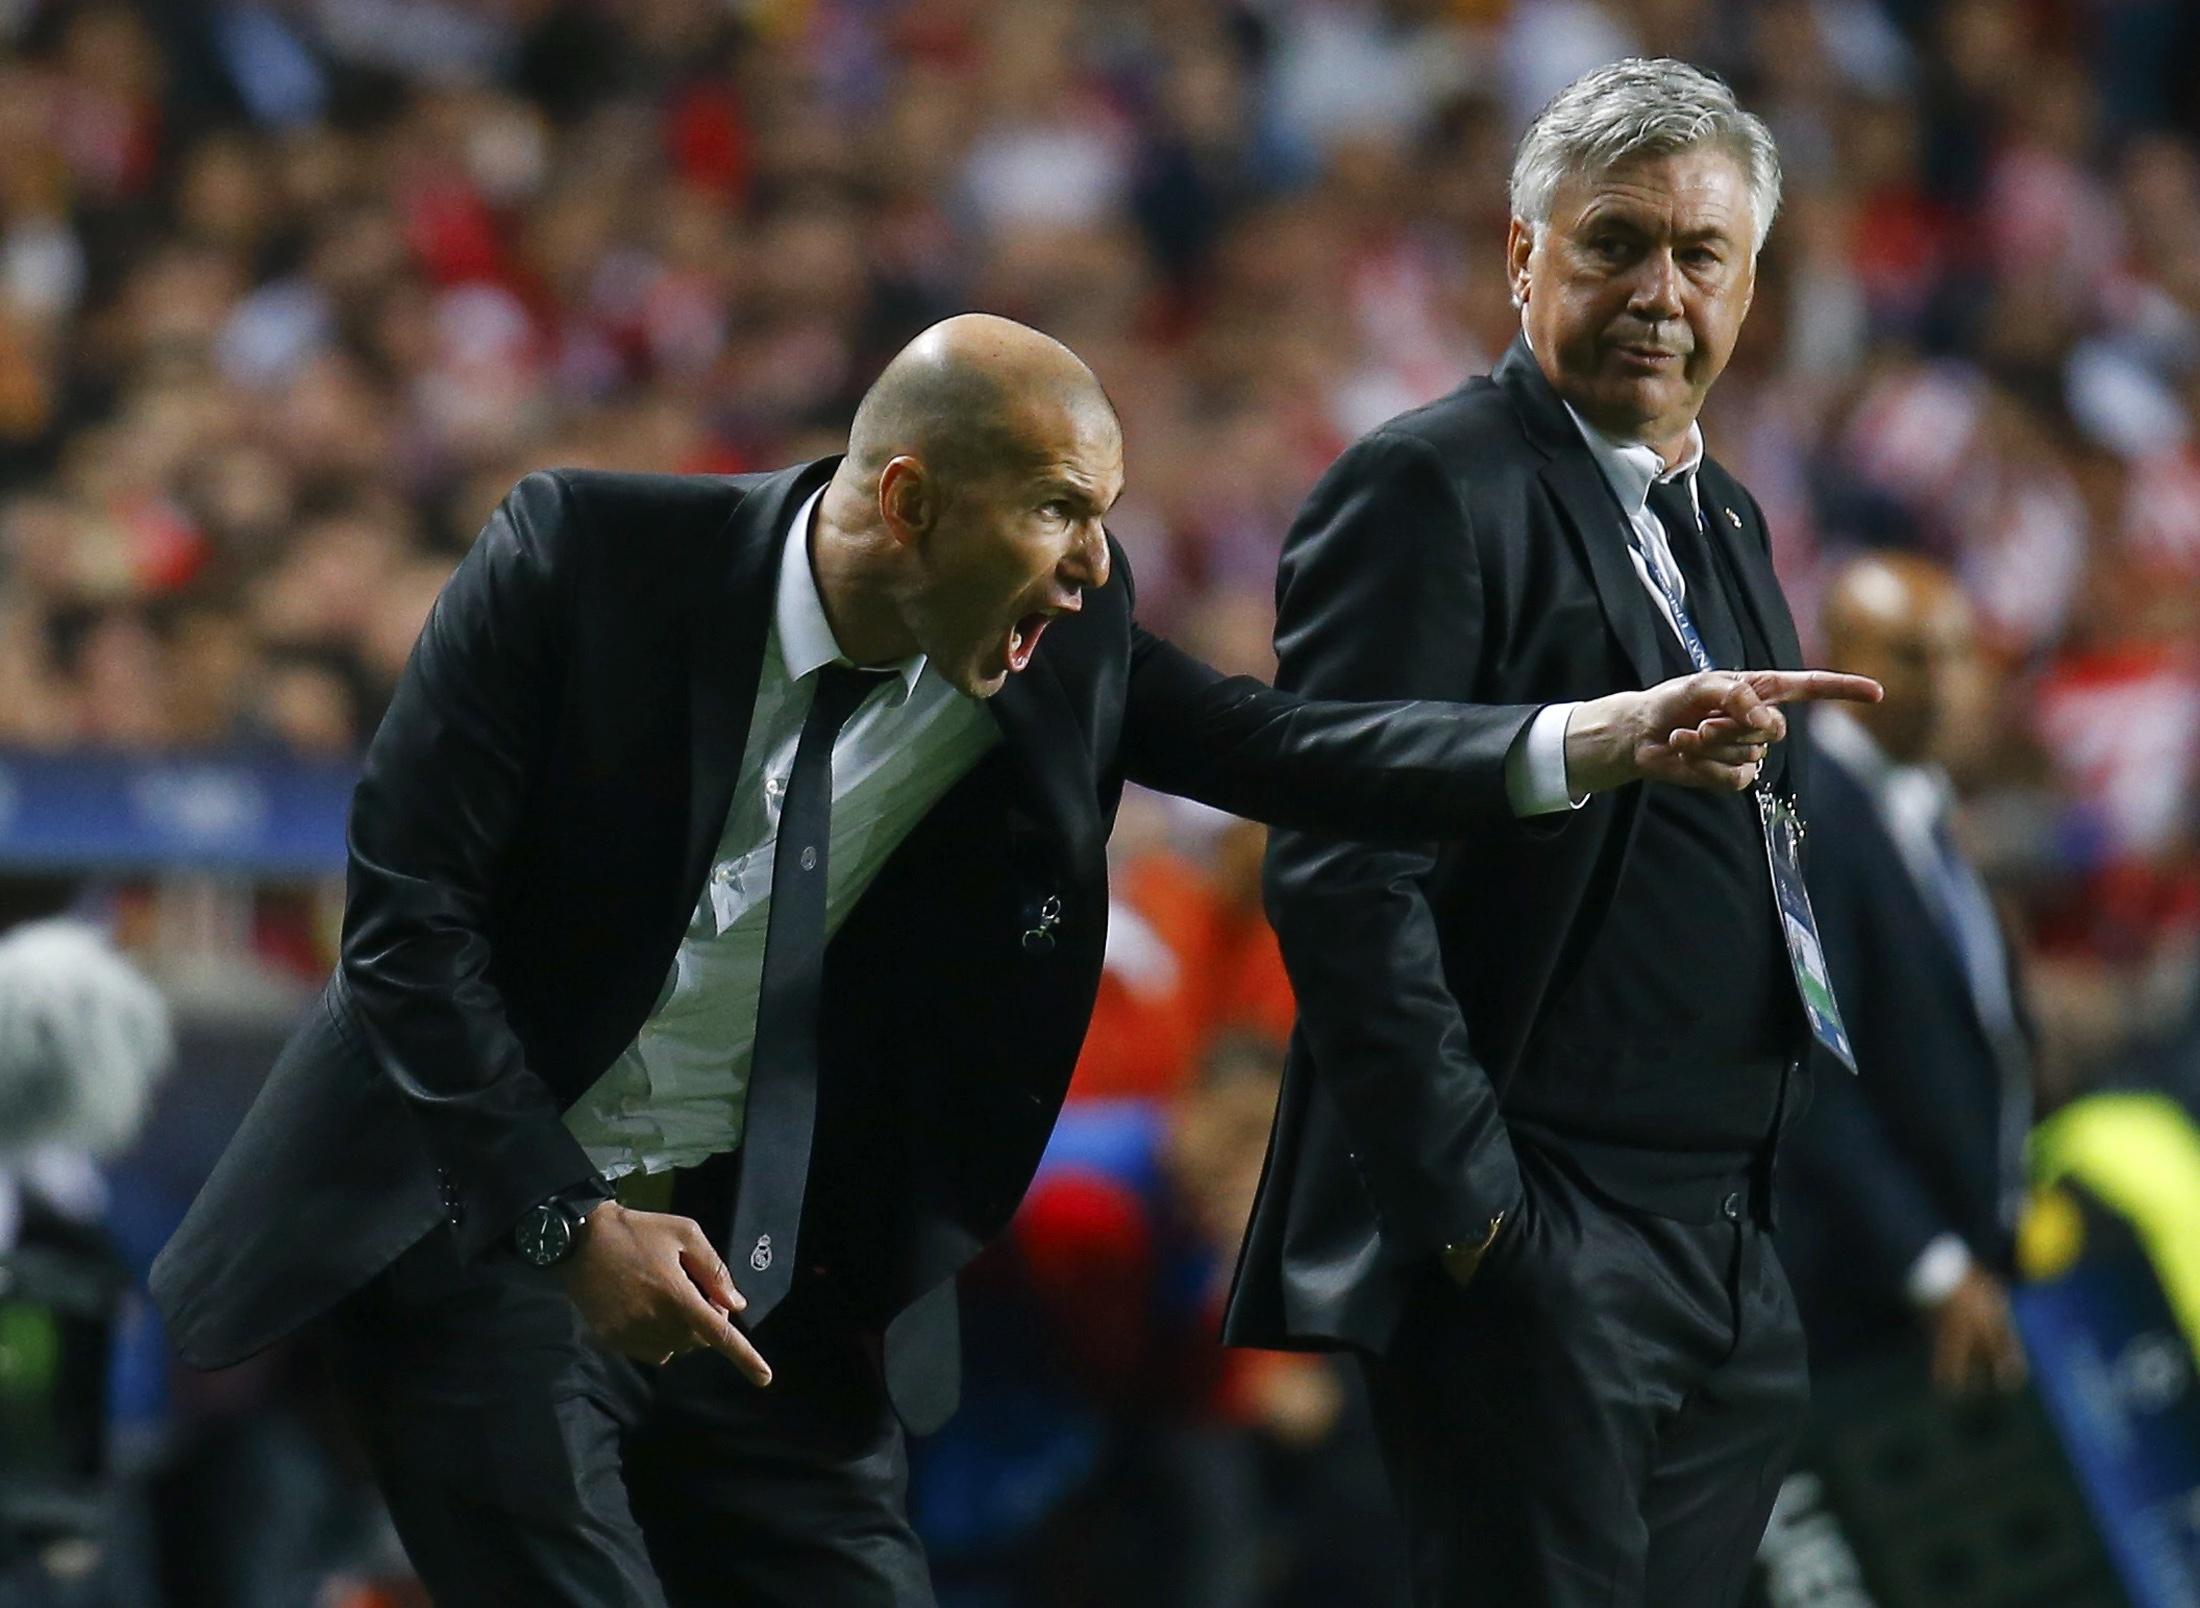 Carlo Ancelotti e Zinedine Zidane